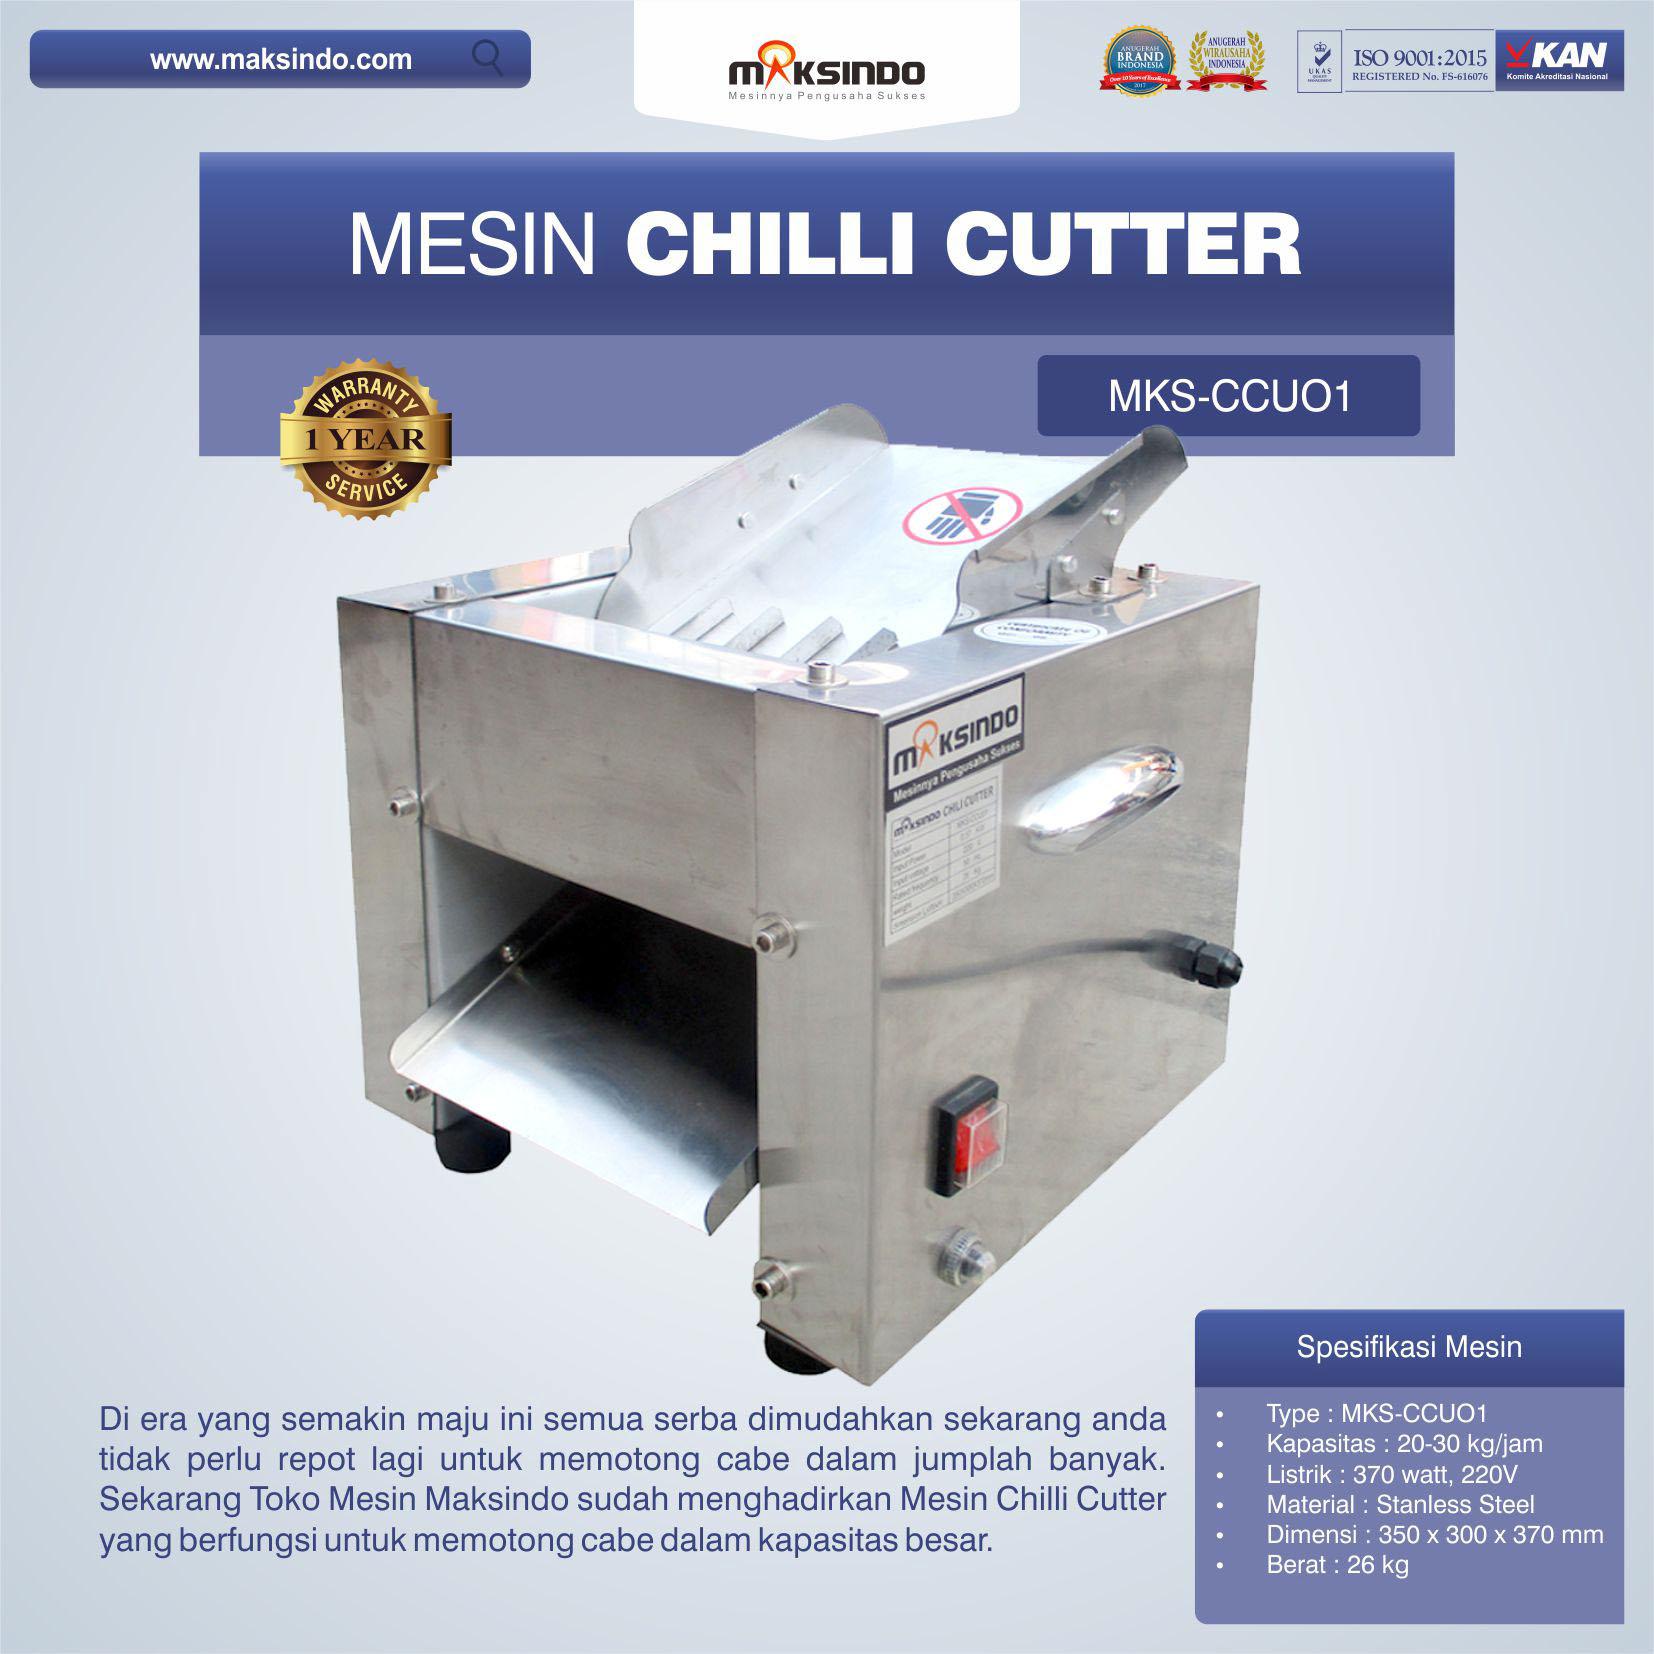 Jual Mesin Chilli Cutter MKS-CCU01 di Bogor